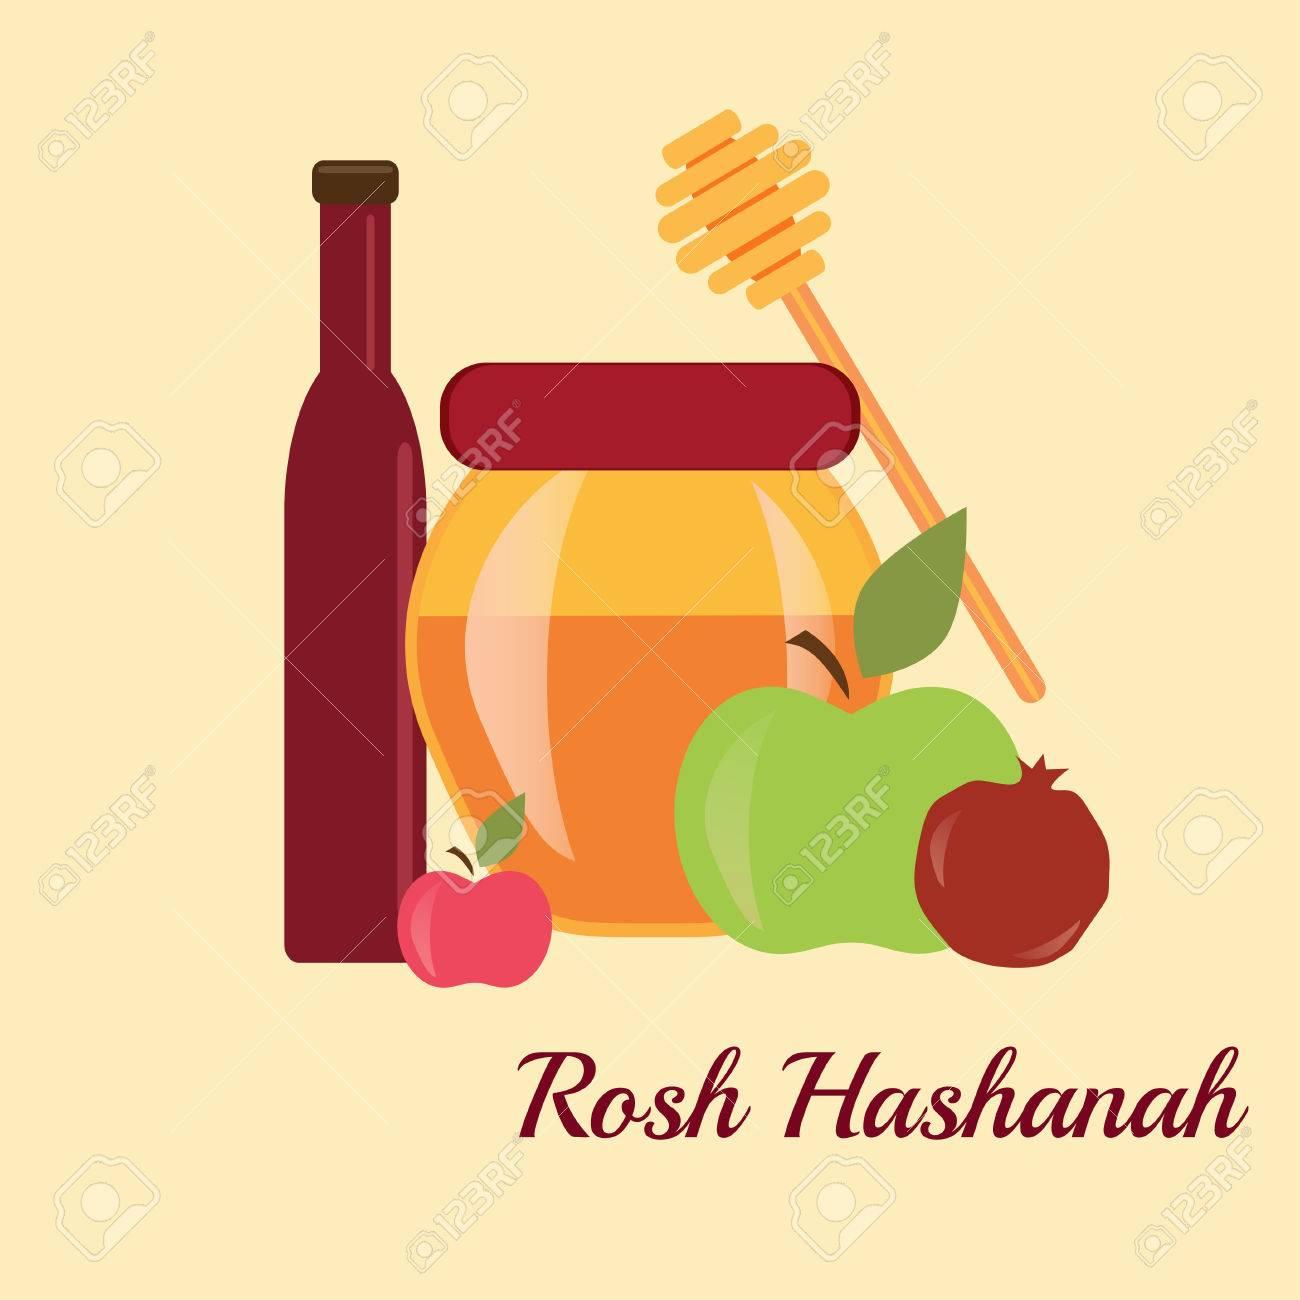 Rosh Hashanah Jewish New Year Greeting Card Set Design With Hand